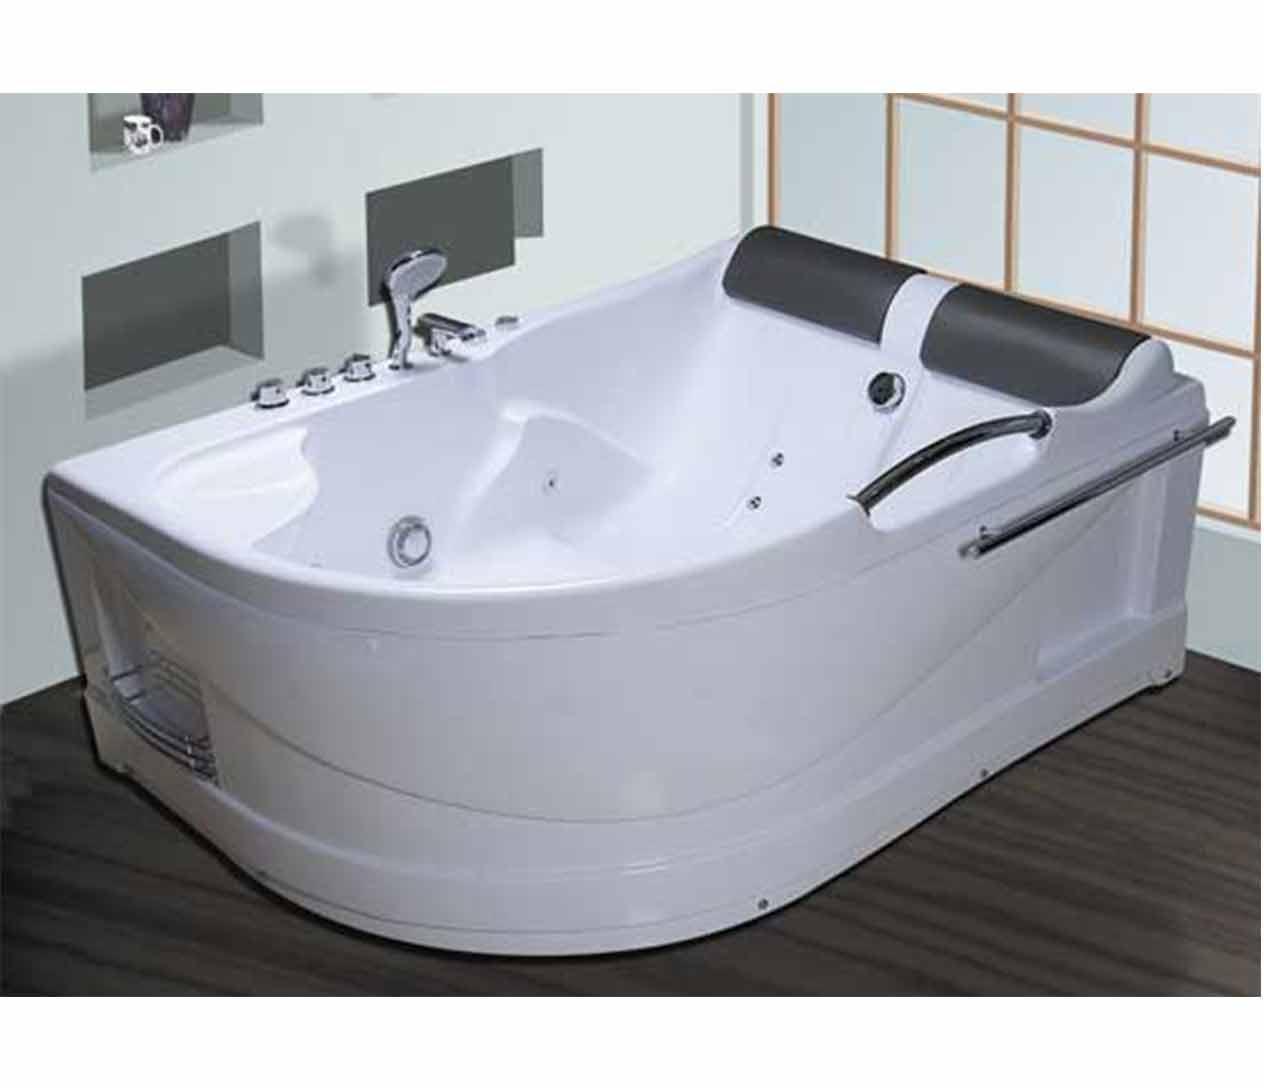 Ax 8080 Jetted Tub R Luxury Spas Inc